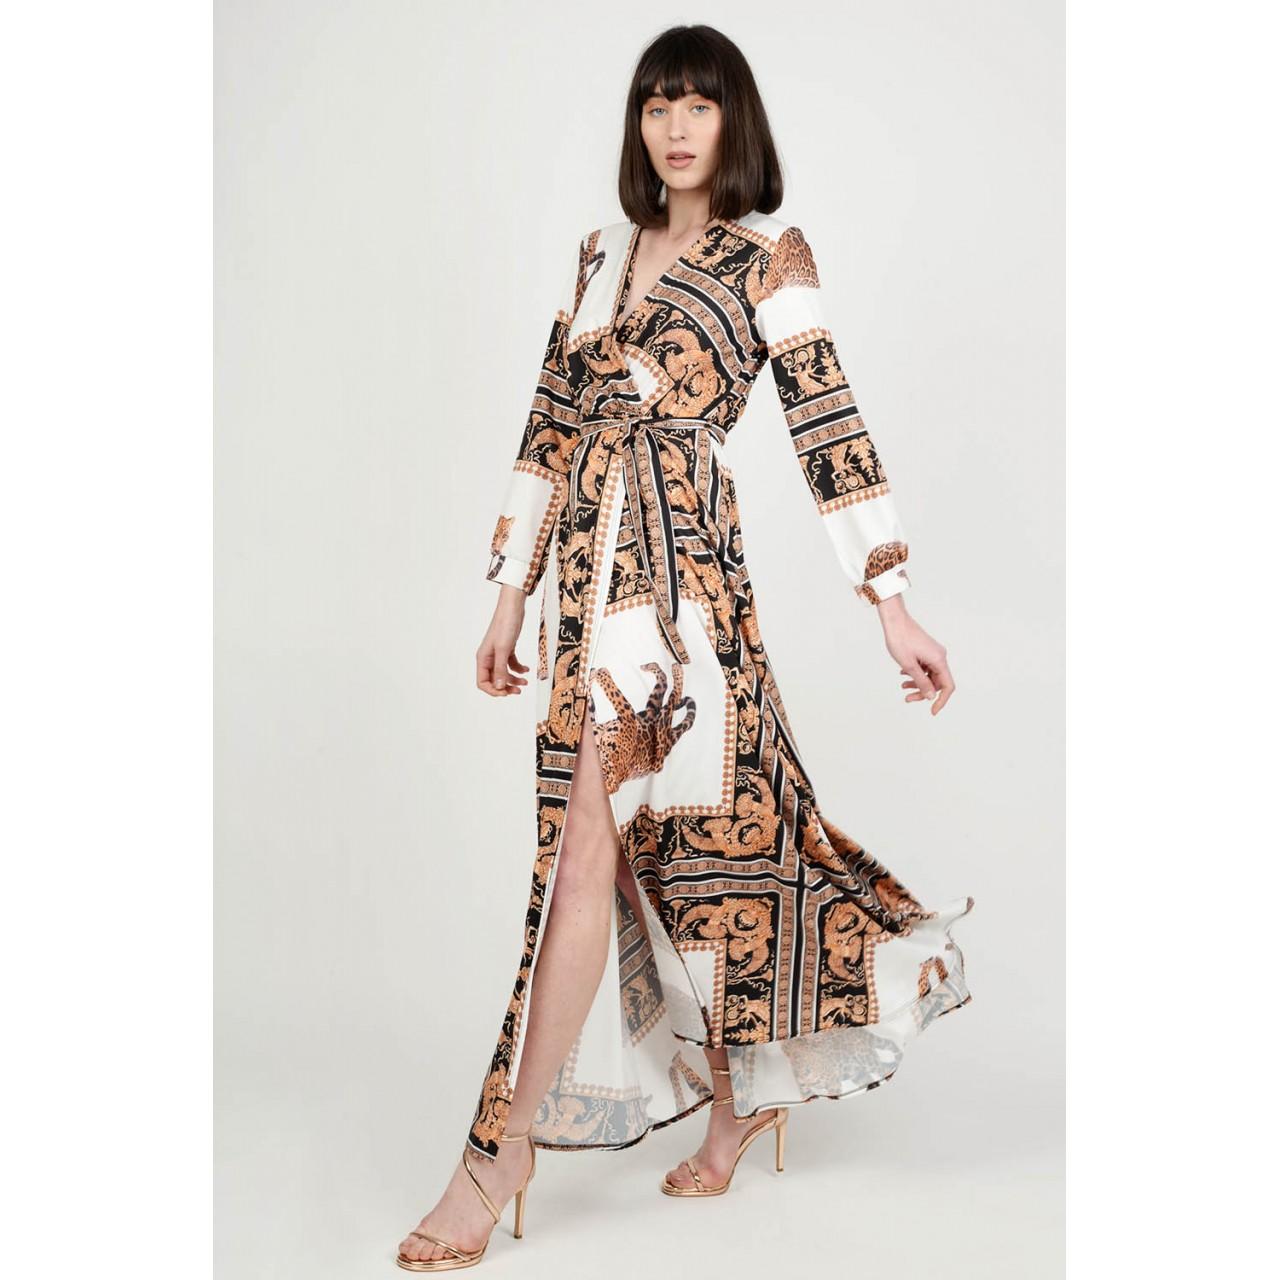 be1d0326df7c Φόρεμα maxi εμπριμέ Limited Edition